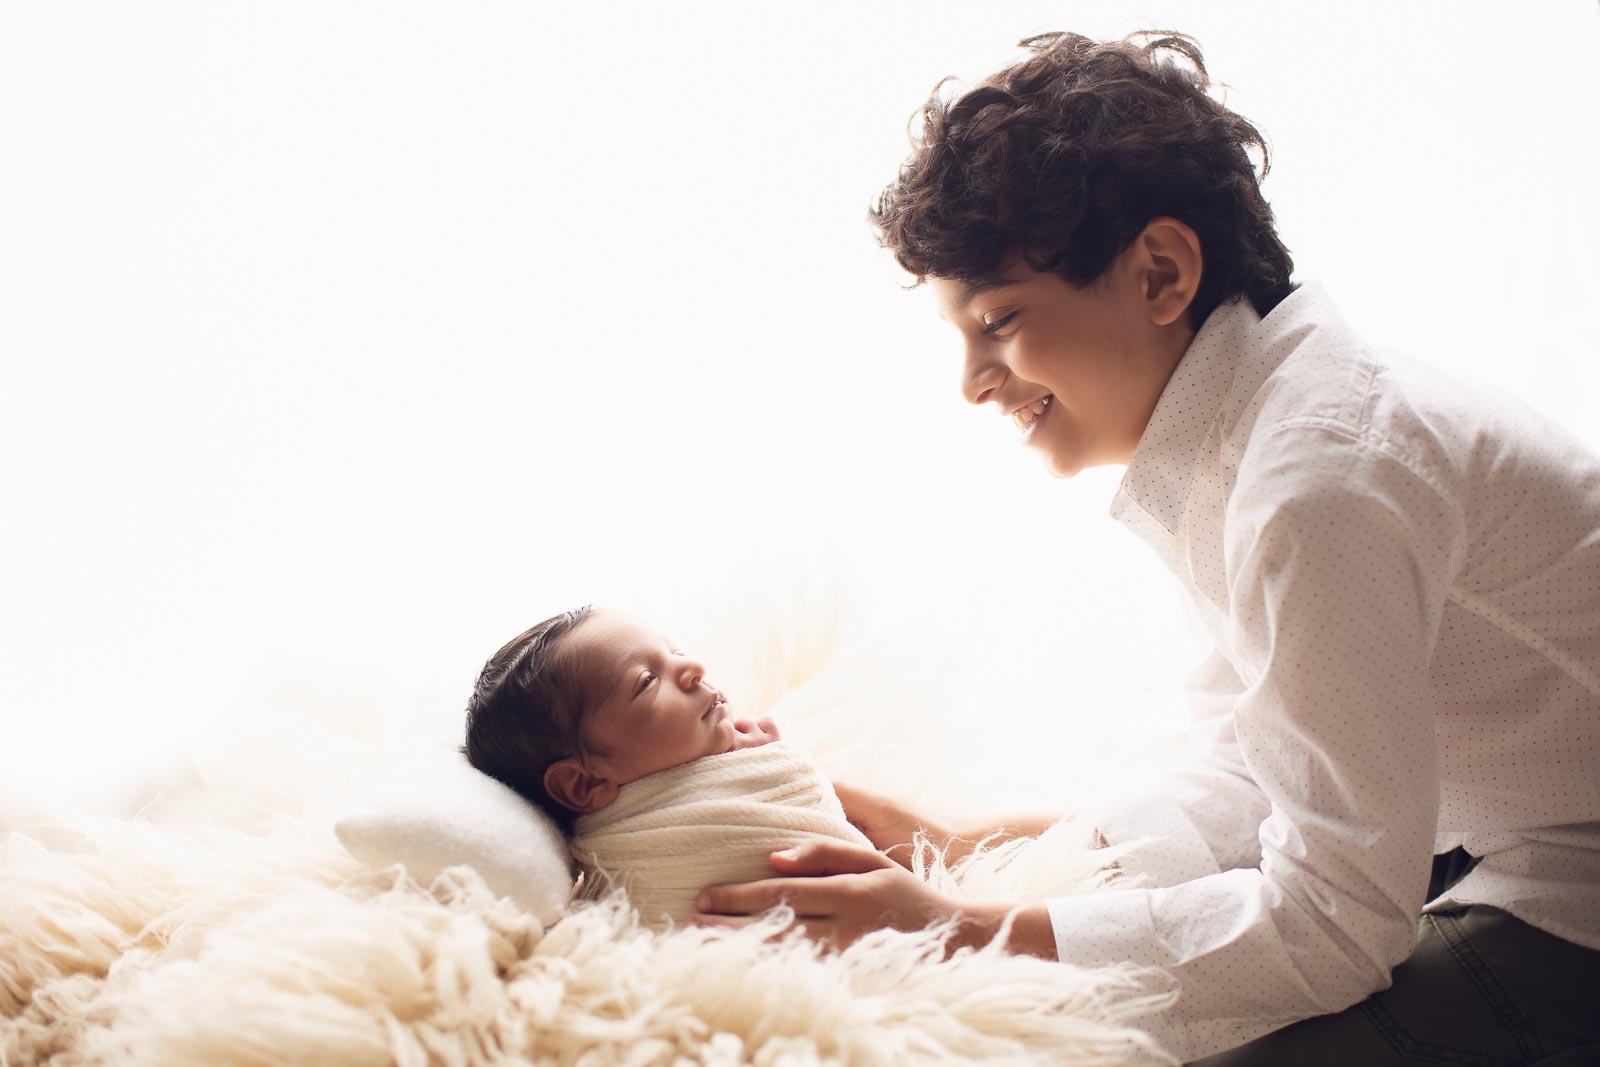 newborn photo silhouette